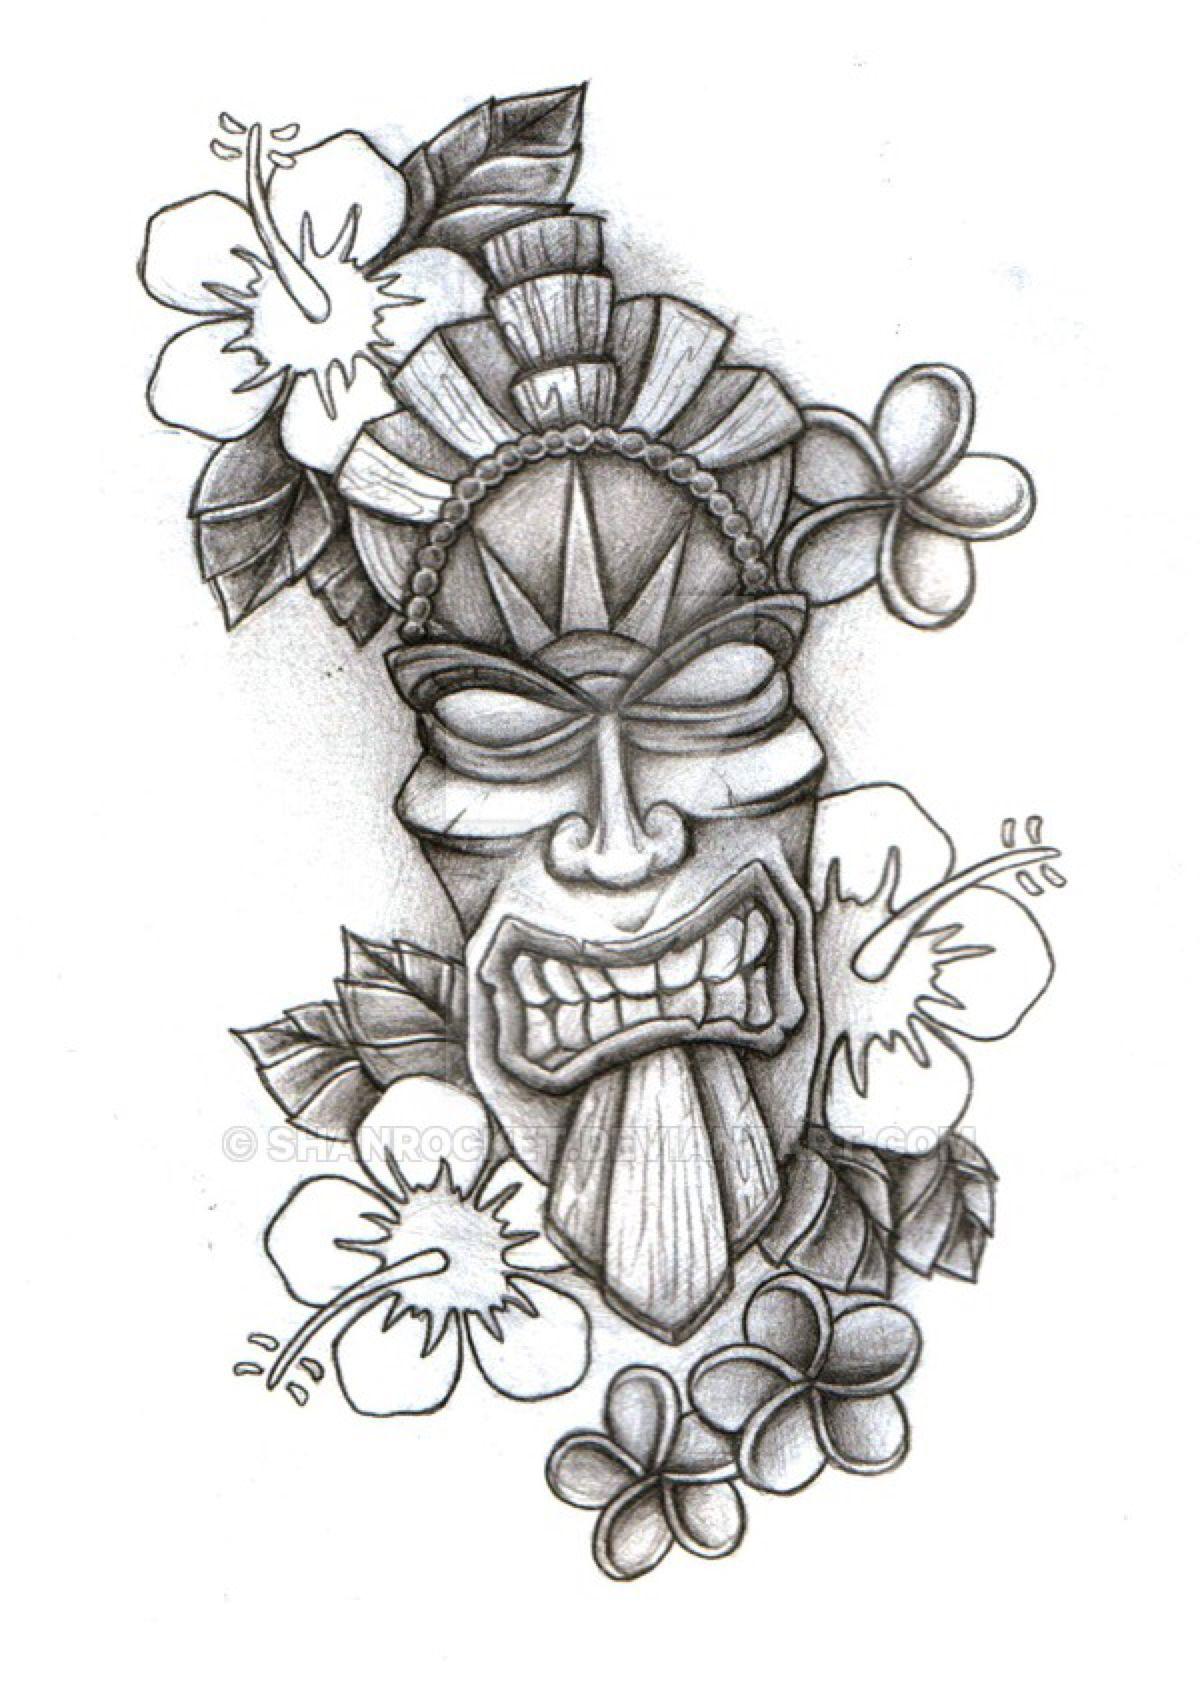 tiki mask sketch by shanrocket on deviantart aztecs haiti pinterest tiki mask sketches. Black Bedroom Furniture Sets. Home Design Ideas